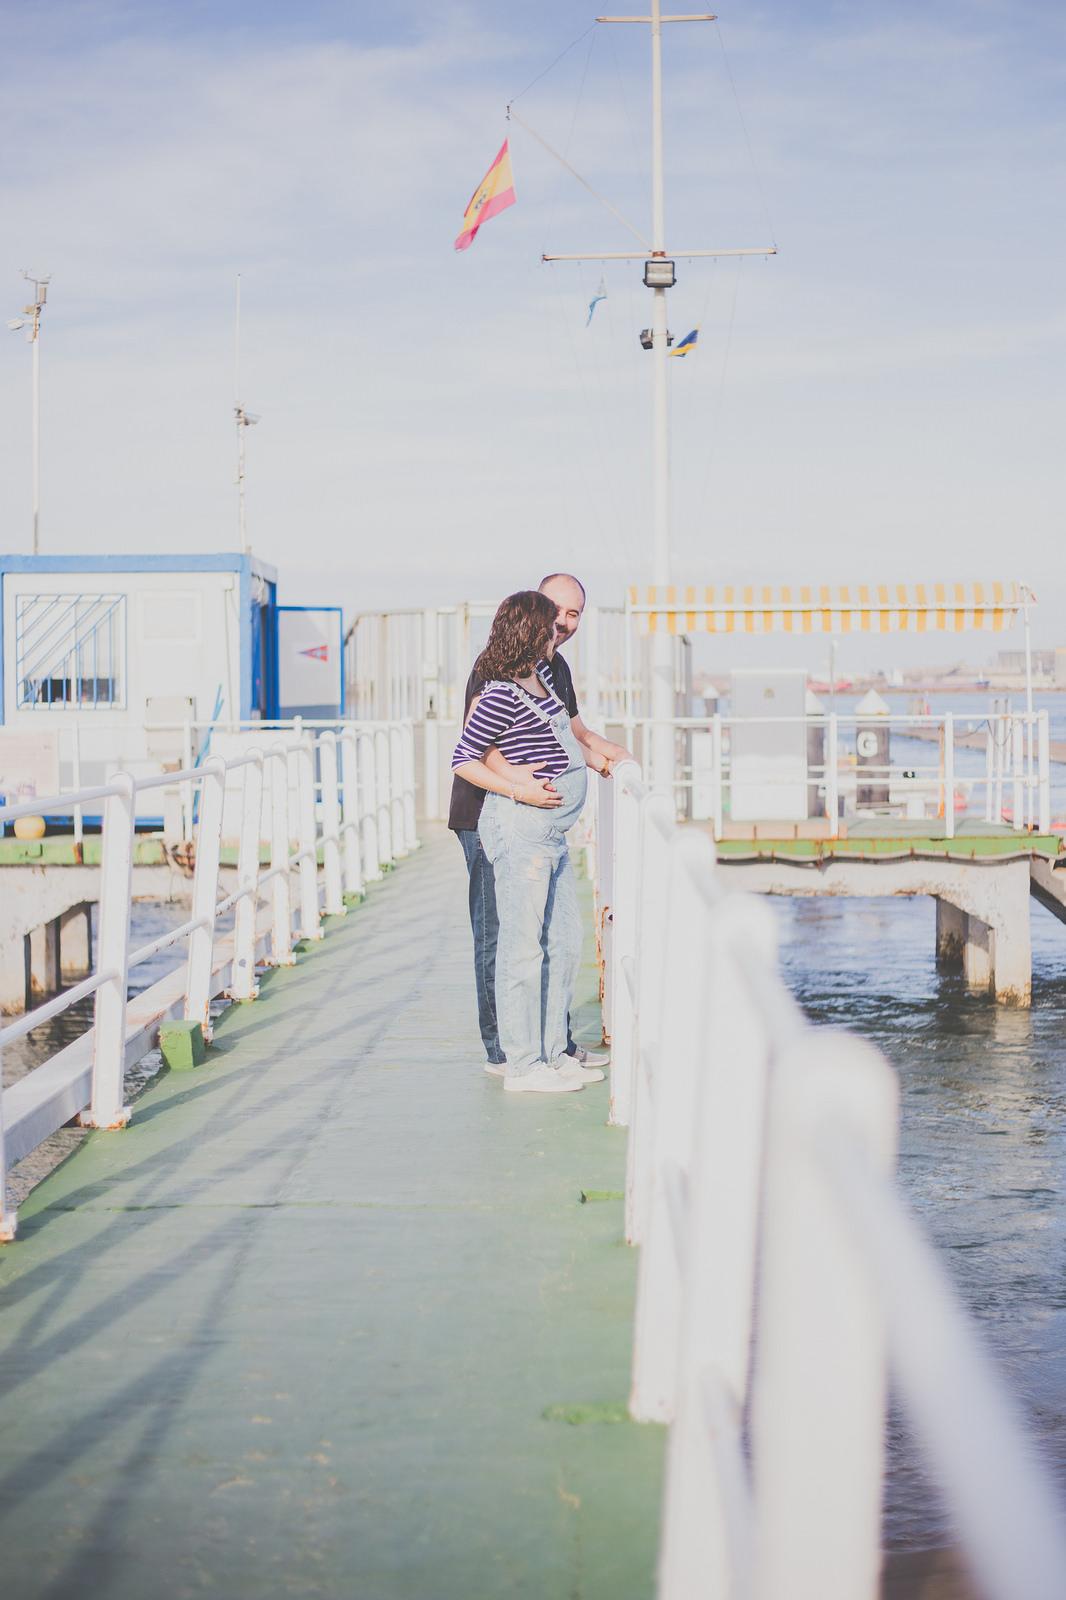 sesion embarazo silvia orduna fotografia huelva playa 8